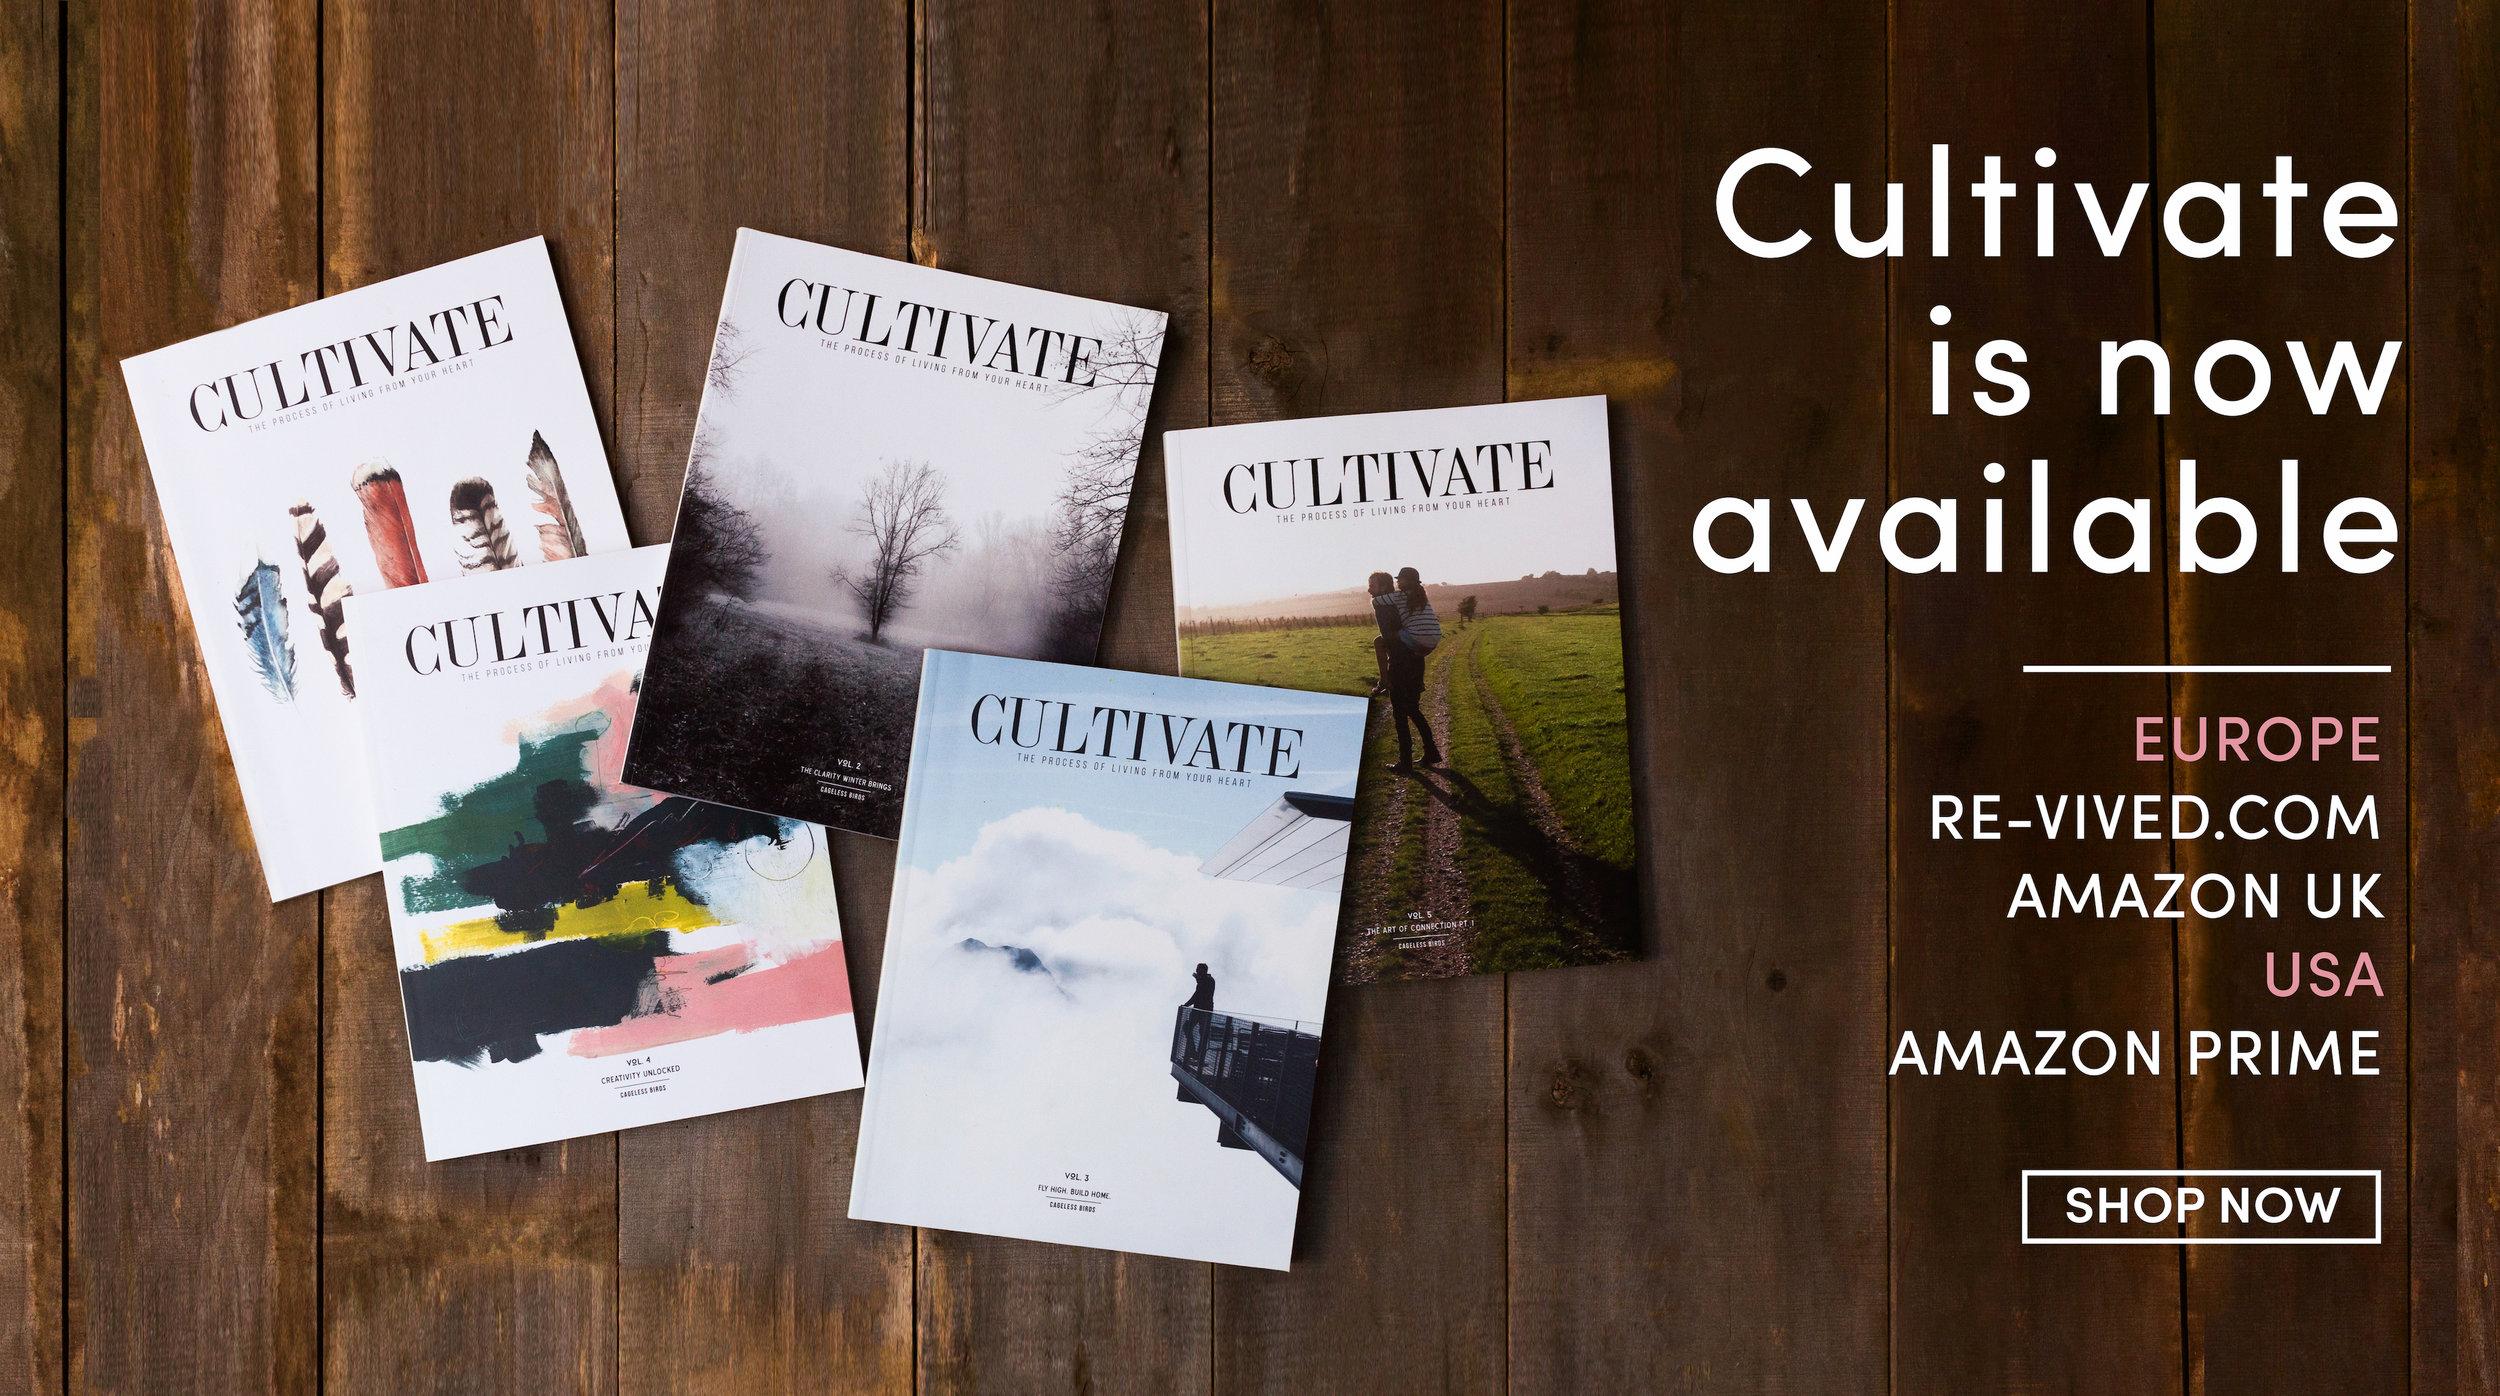 cultivate_europe_banner.jpg